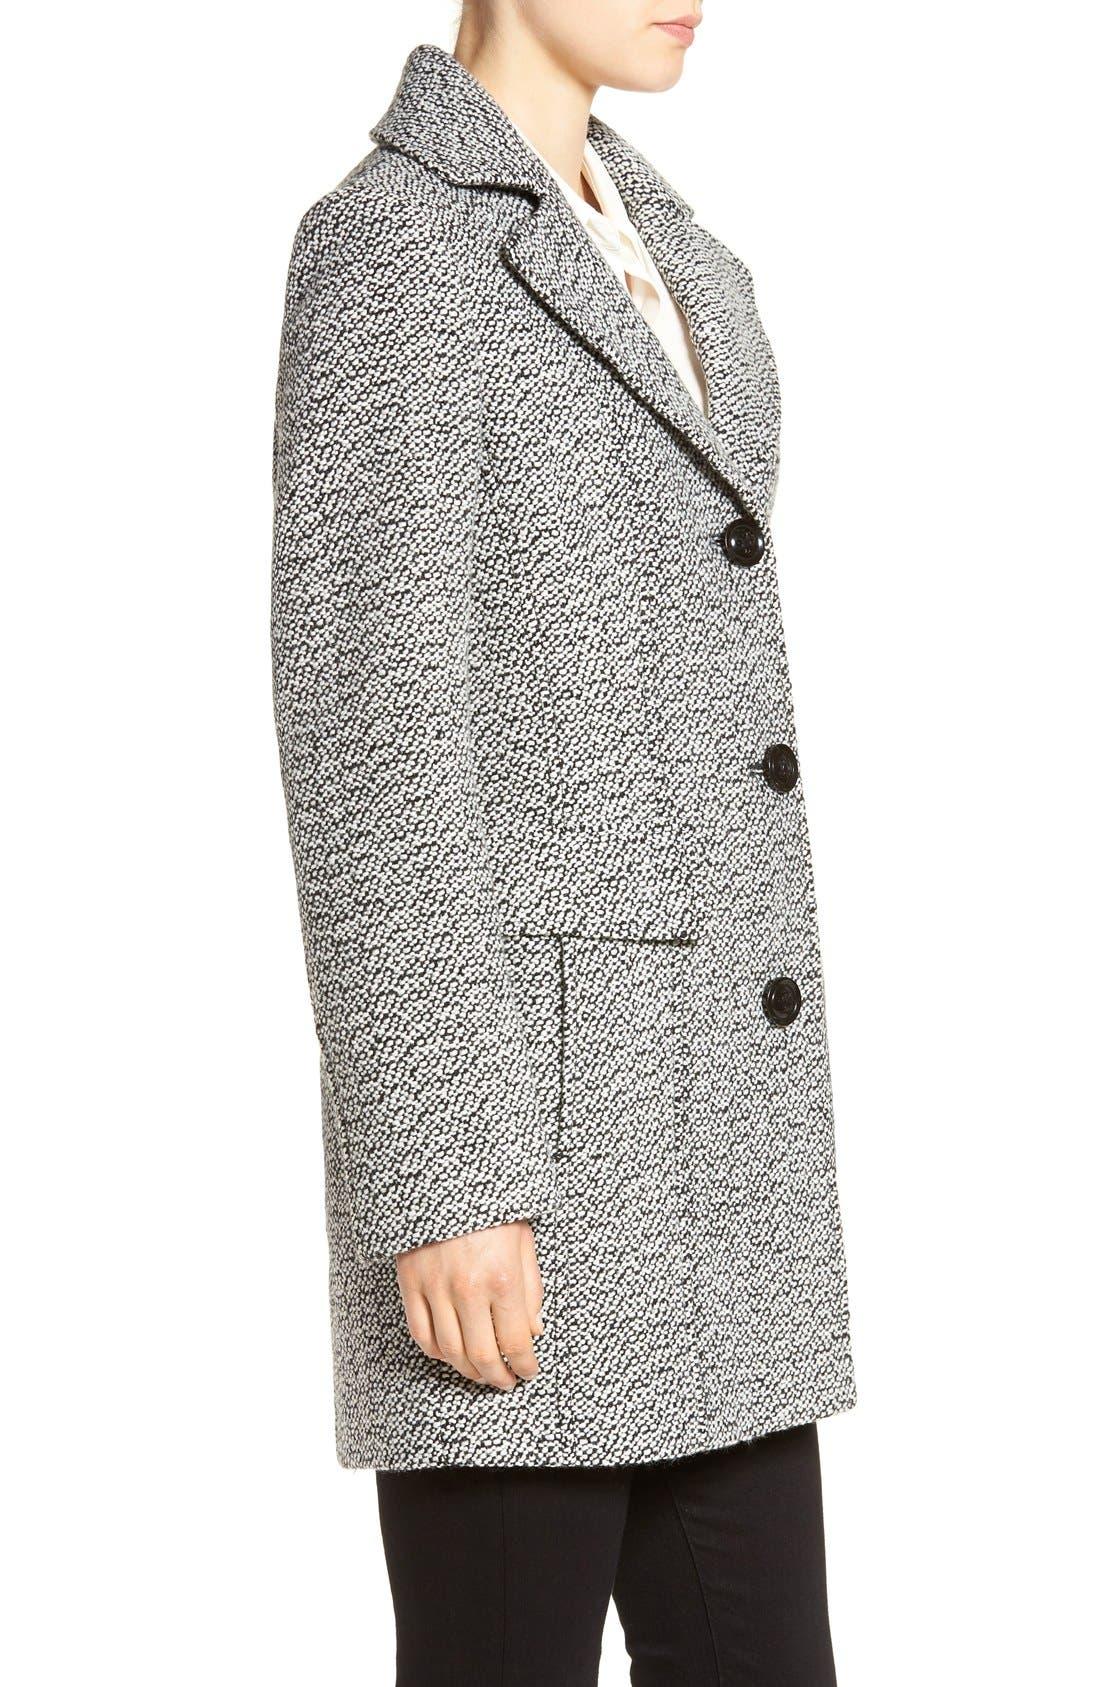 Notch Collar Tweed Coat,                             Alternate thumbnail 3, color,                             White/ Black